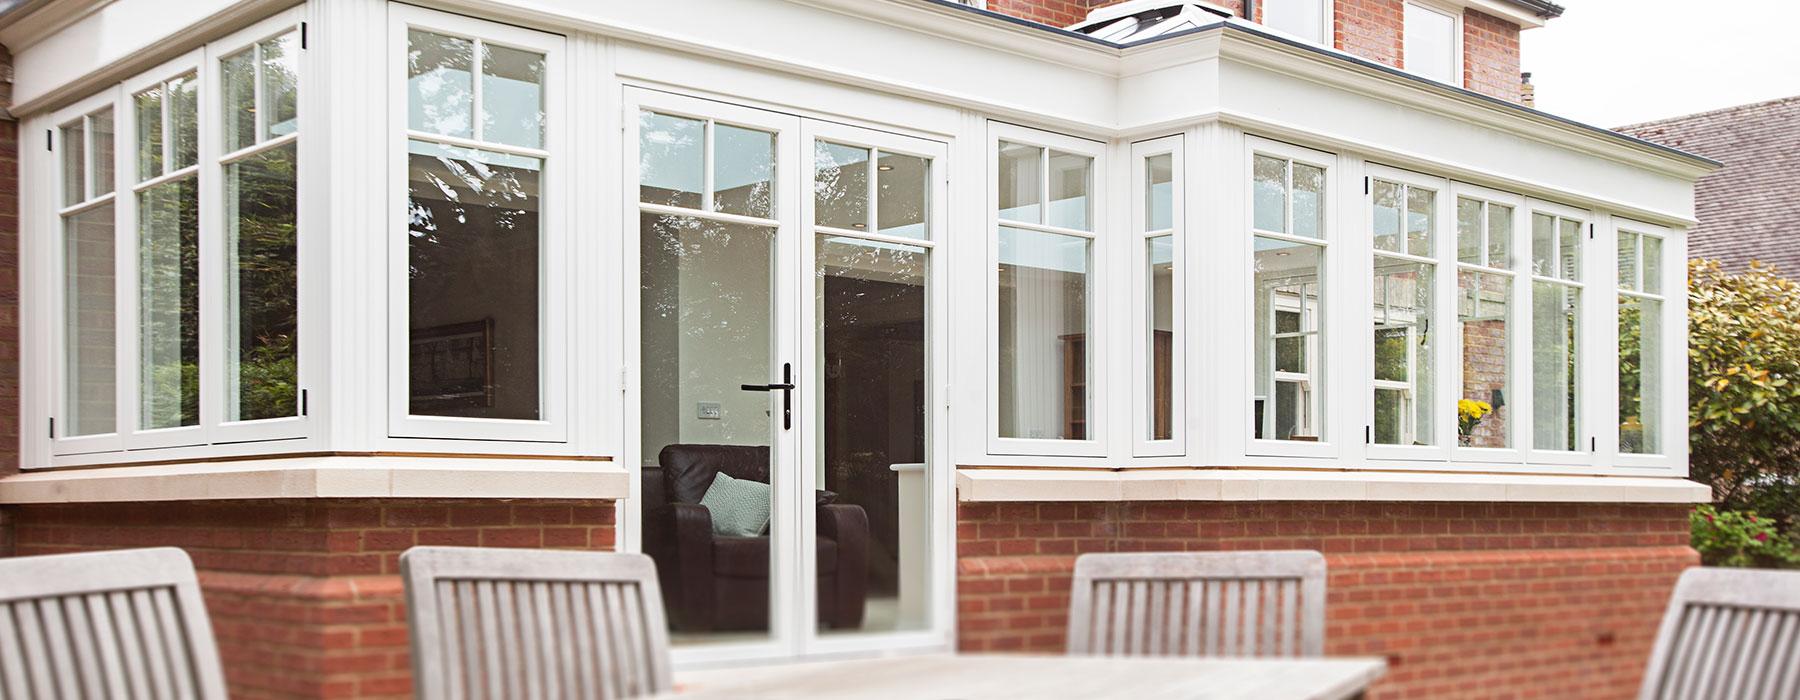 Oxfordshire R9 windows